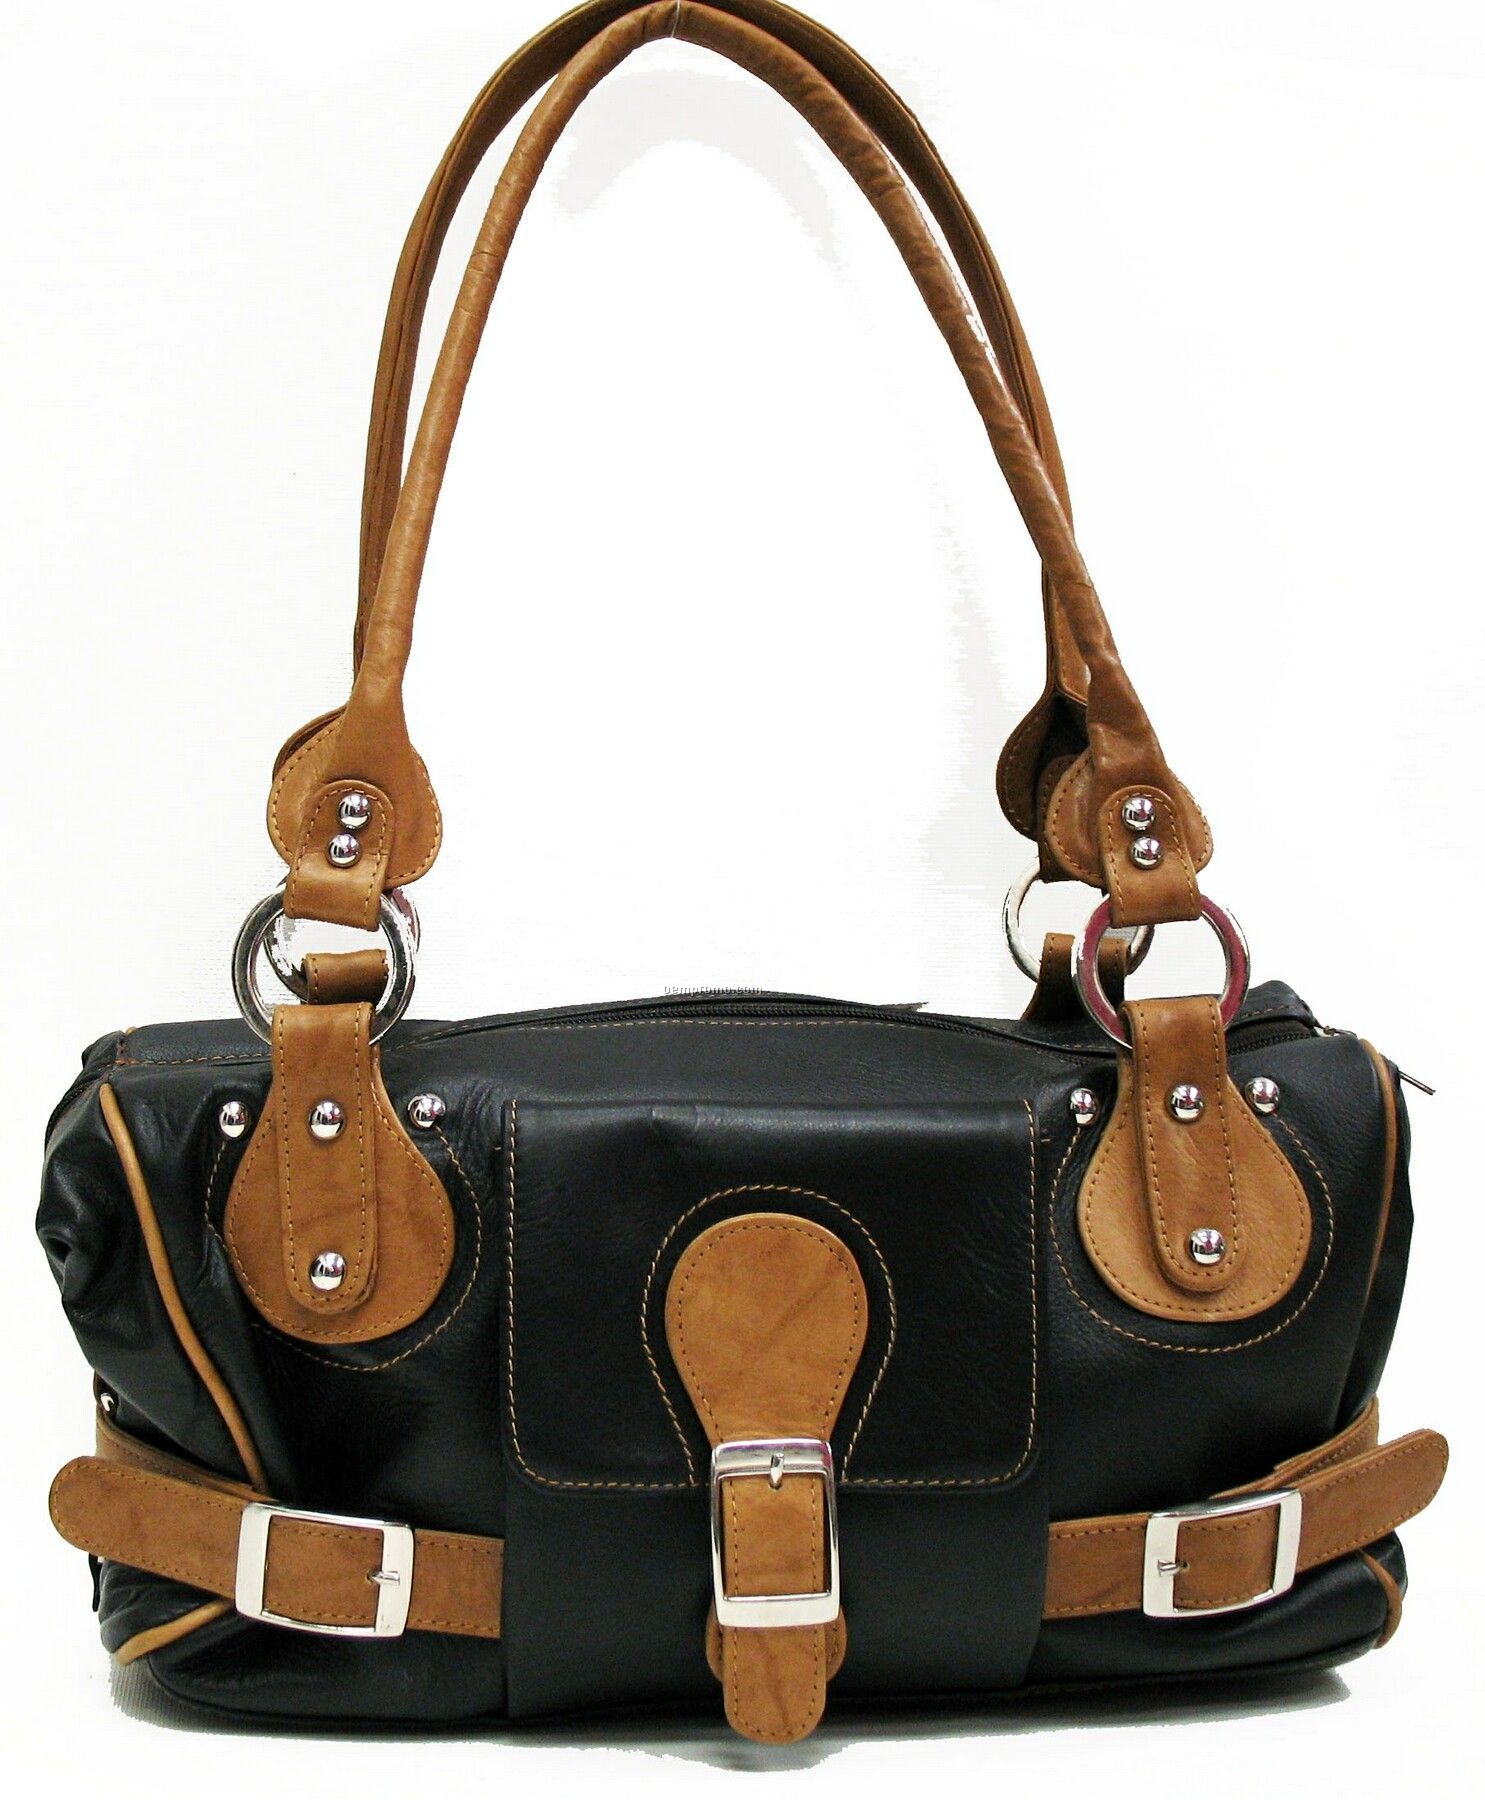 2 Tone Equestrian Bag W /Double Handle / Black